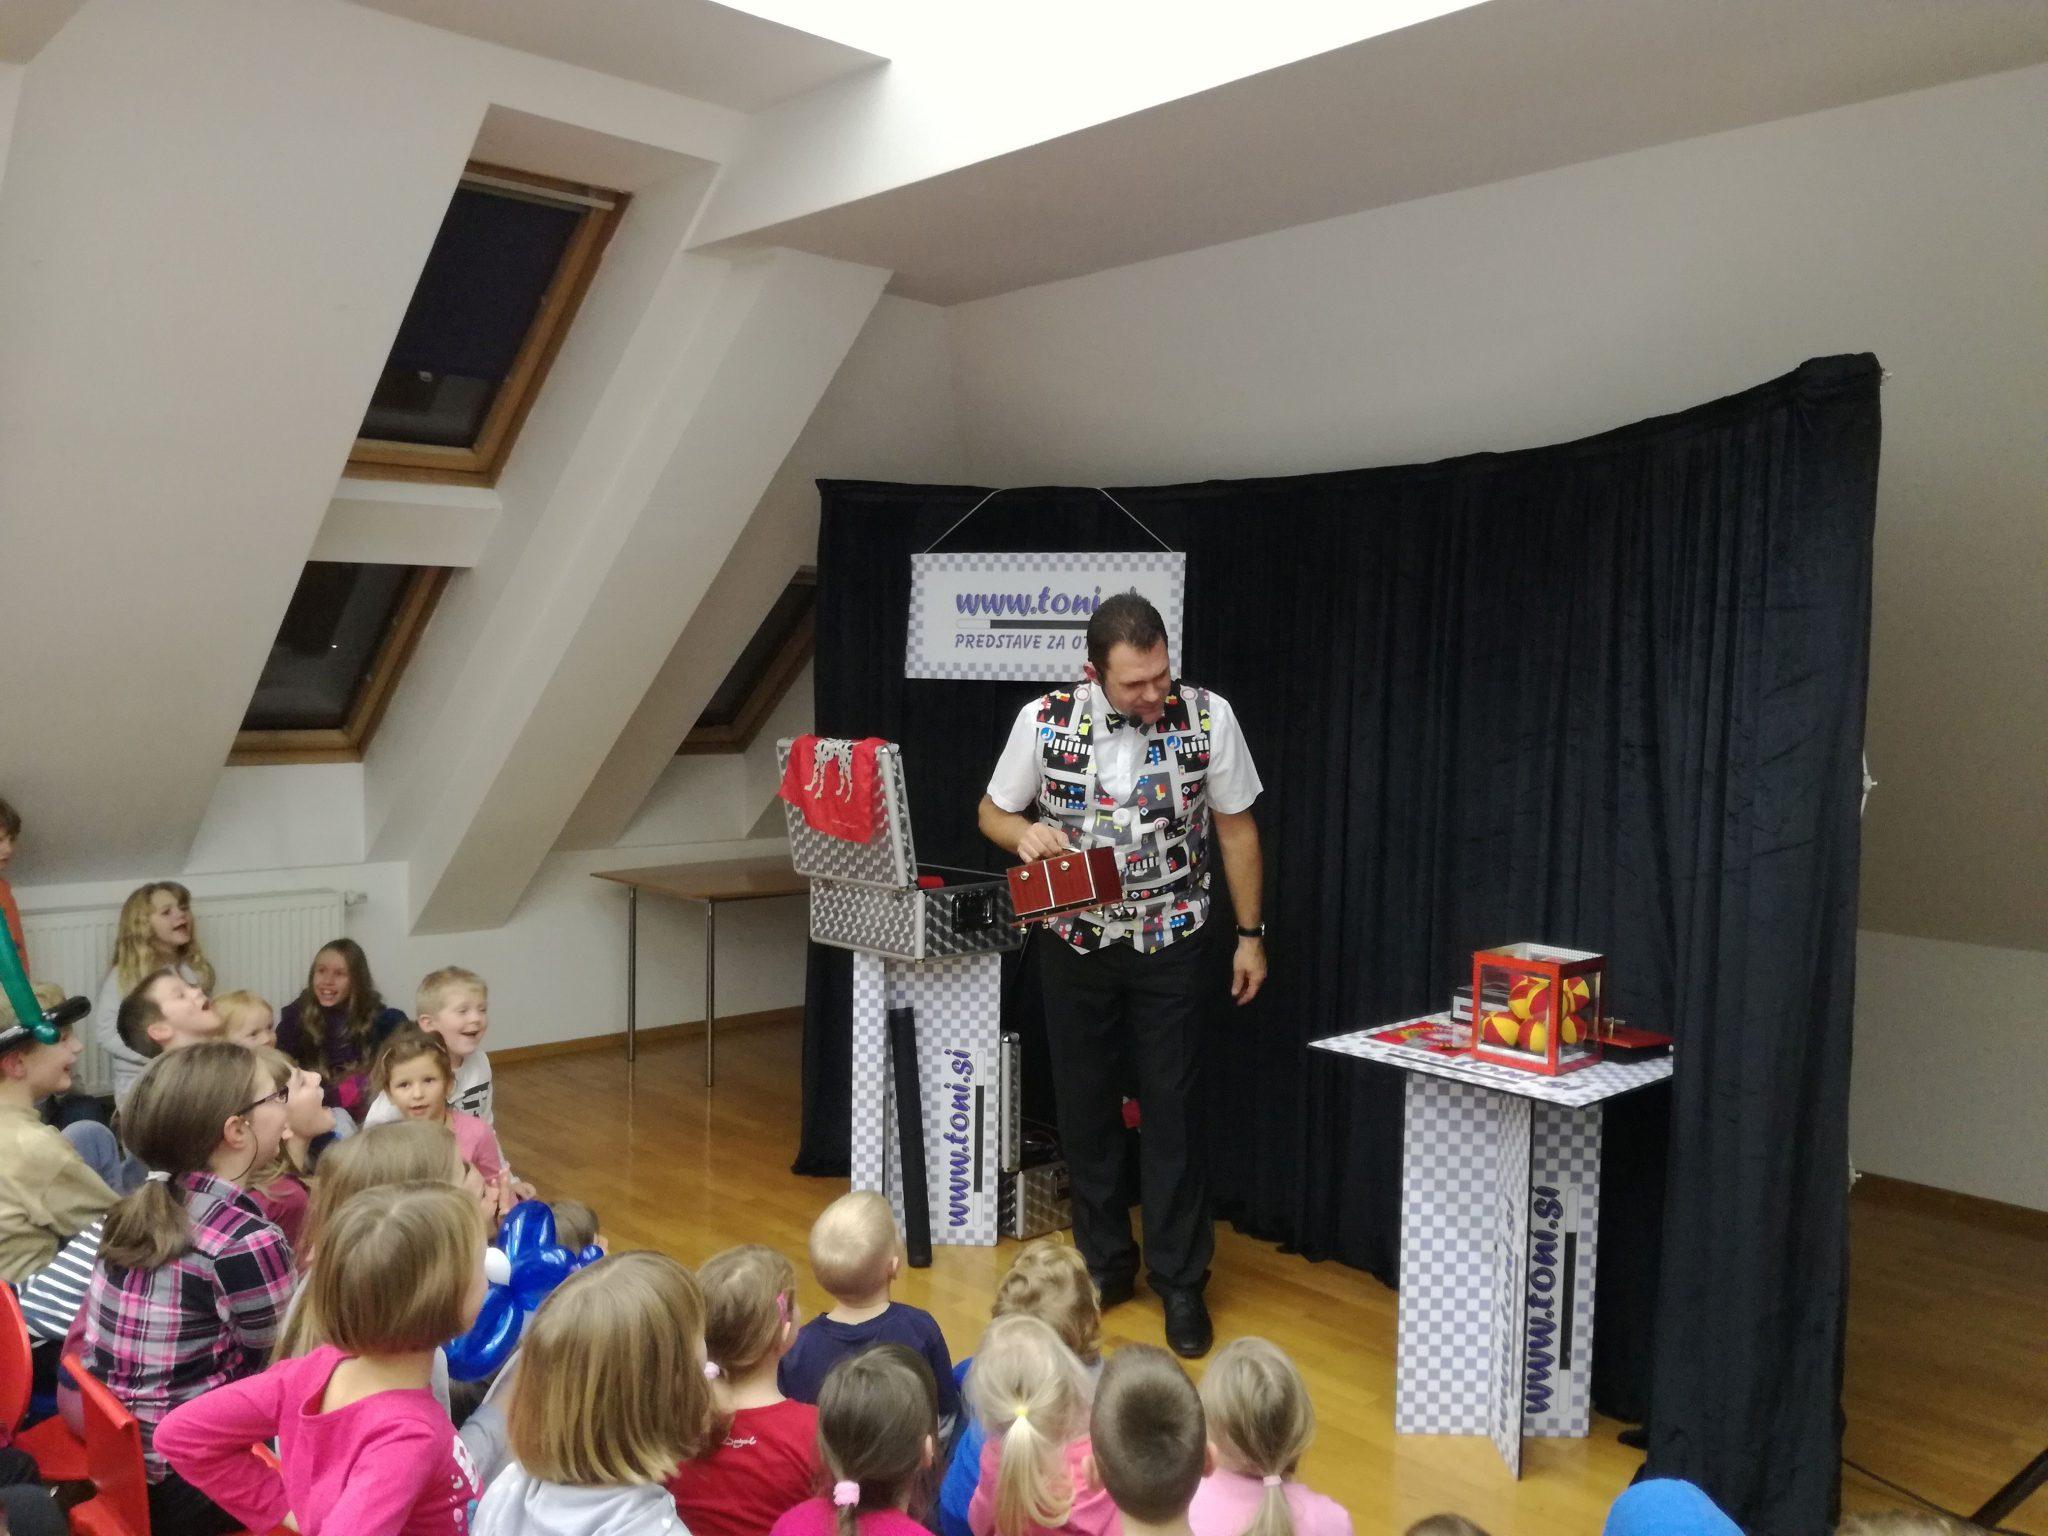 IMG 20171128 174104 - Predstava s čarodejem Tonijem